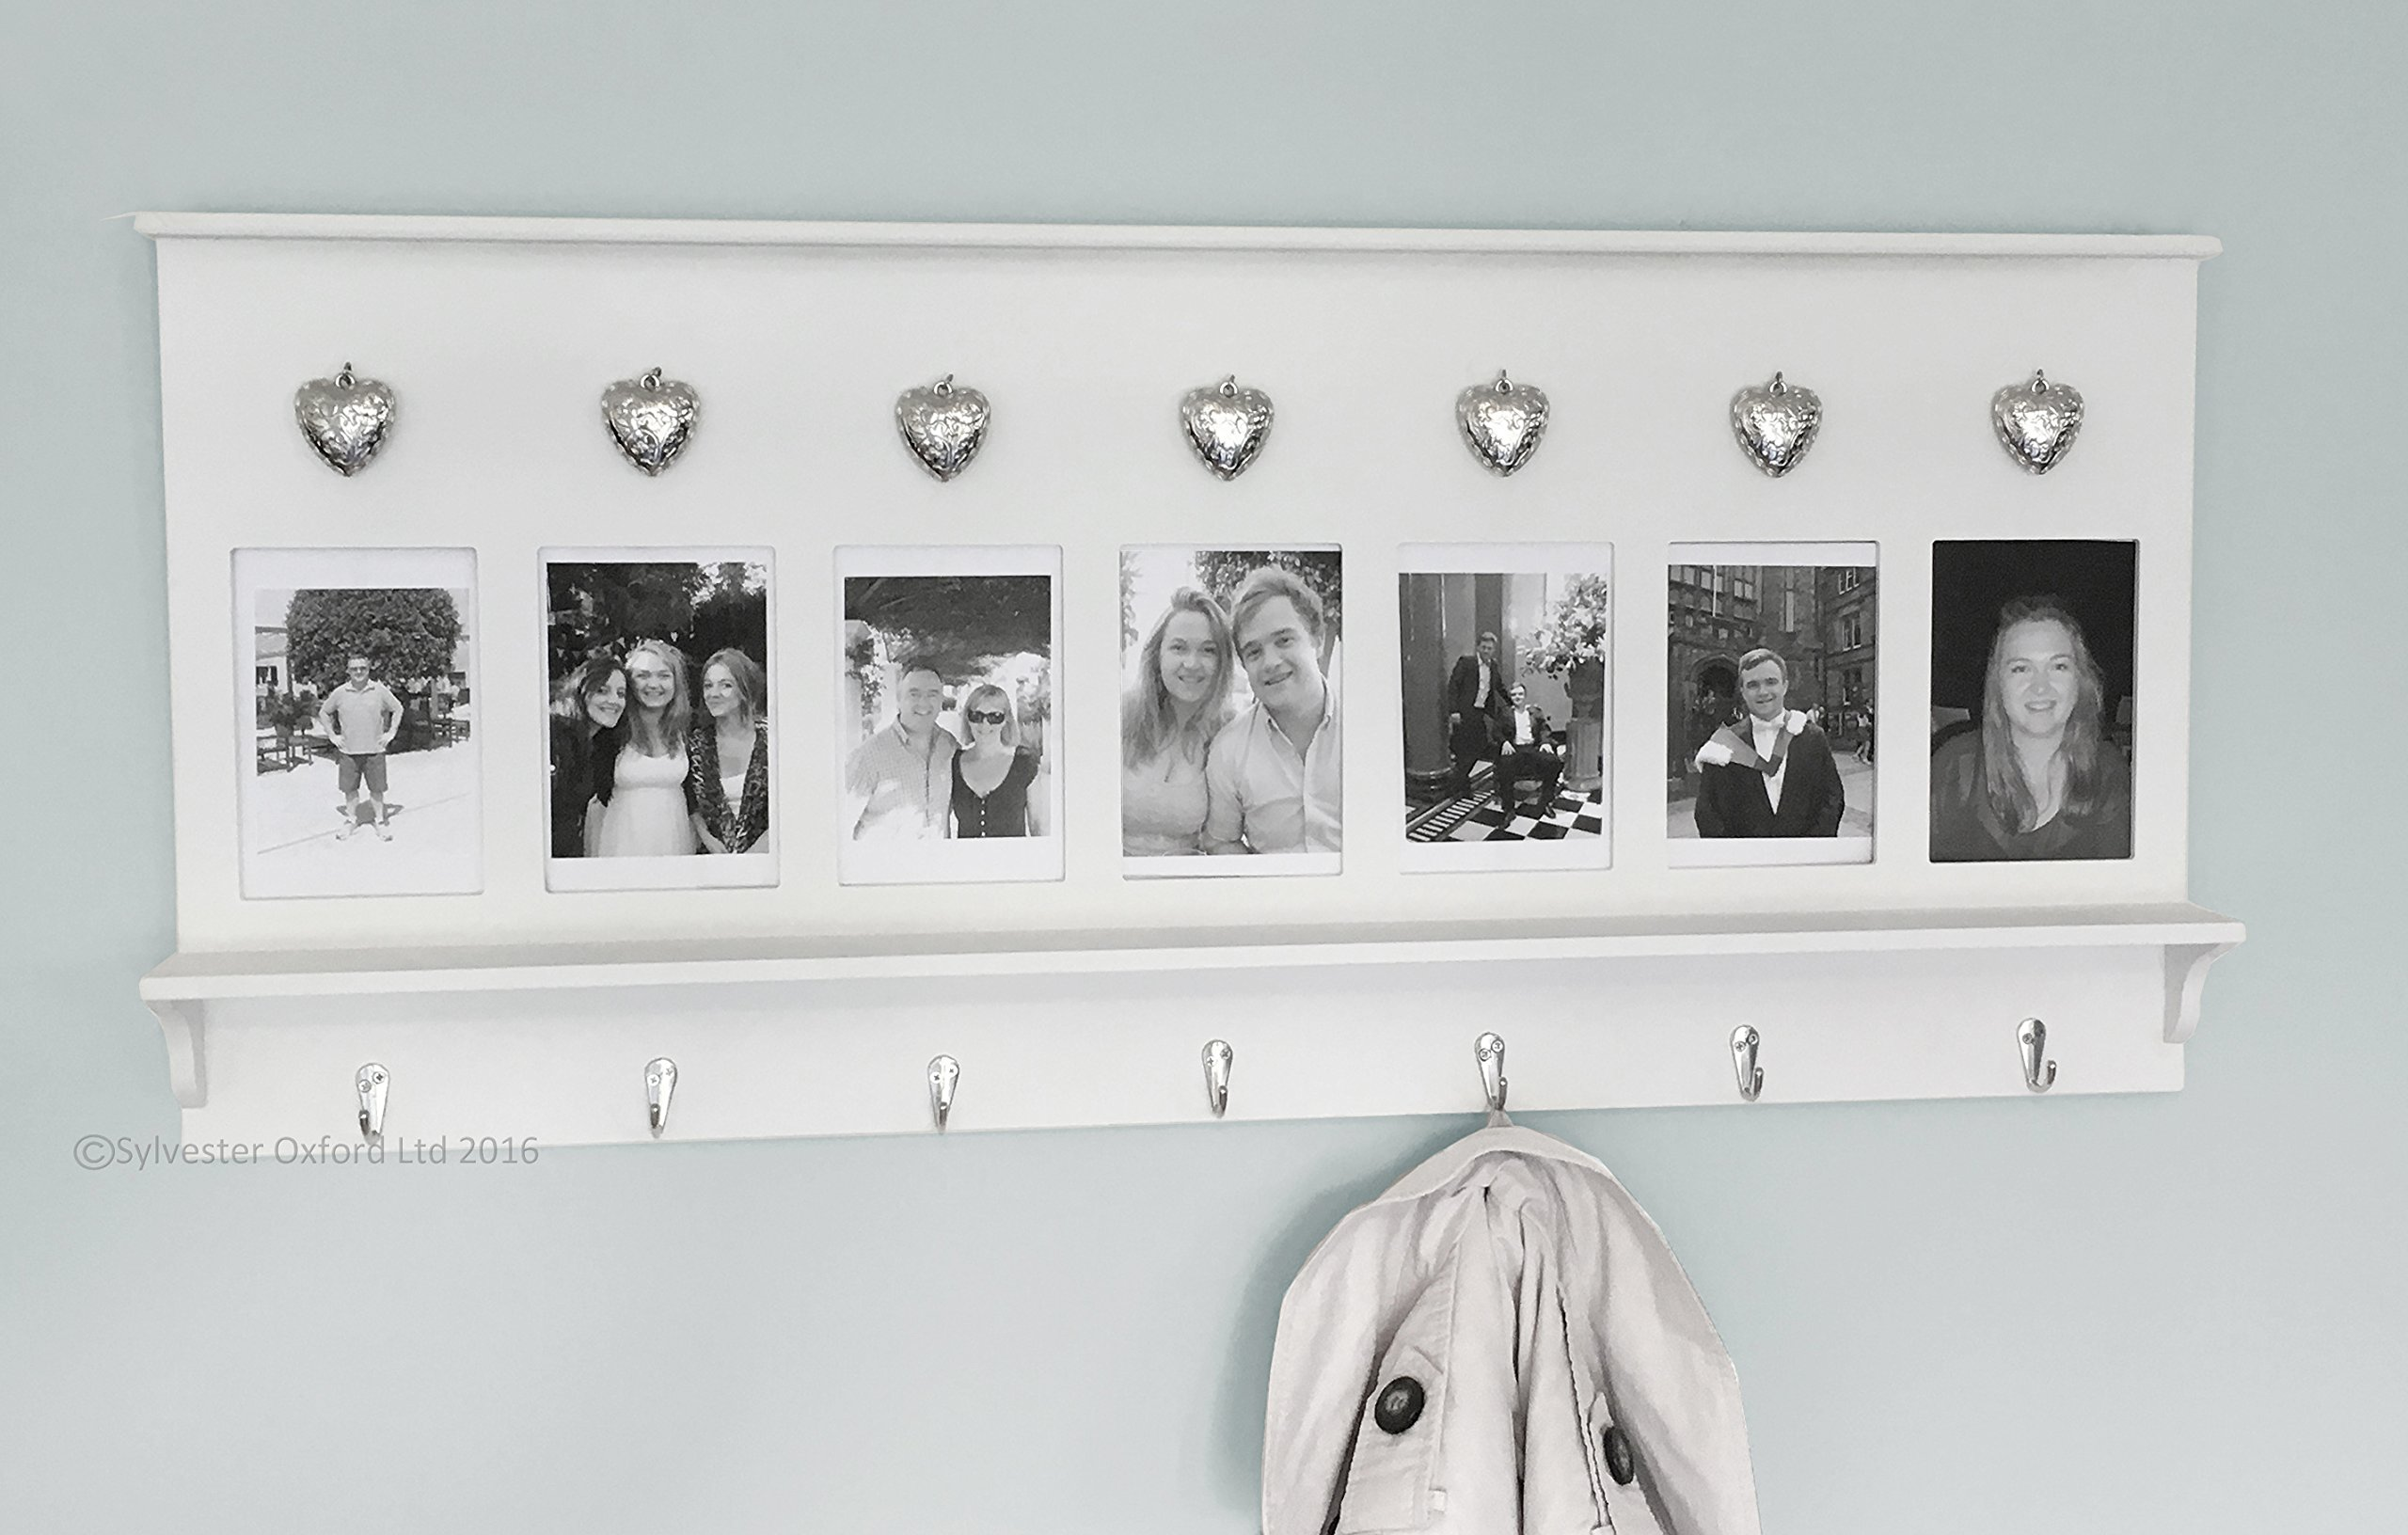 Wall Mounted Coat Rack Wooden Shelving Unit Hooks Photo Frames ...